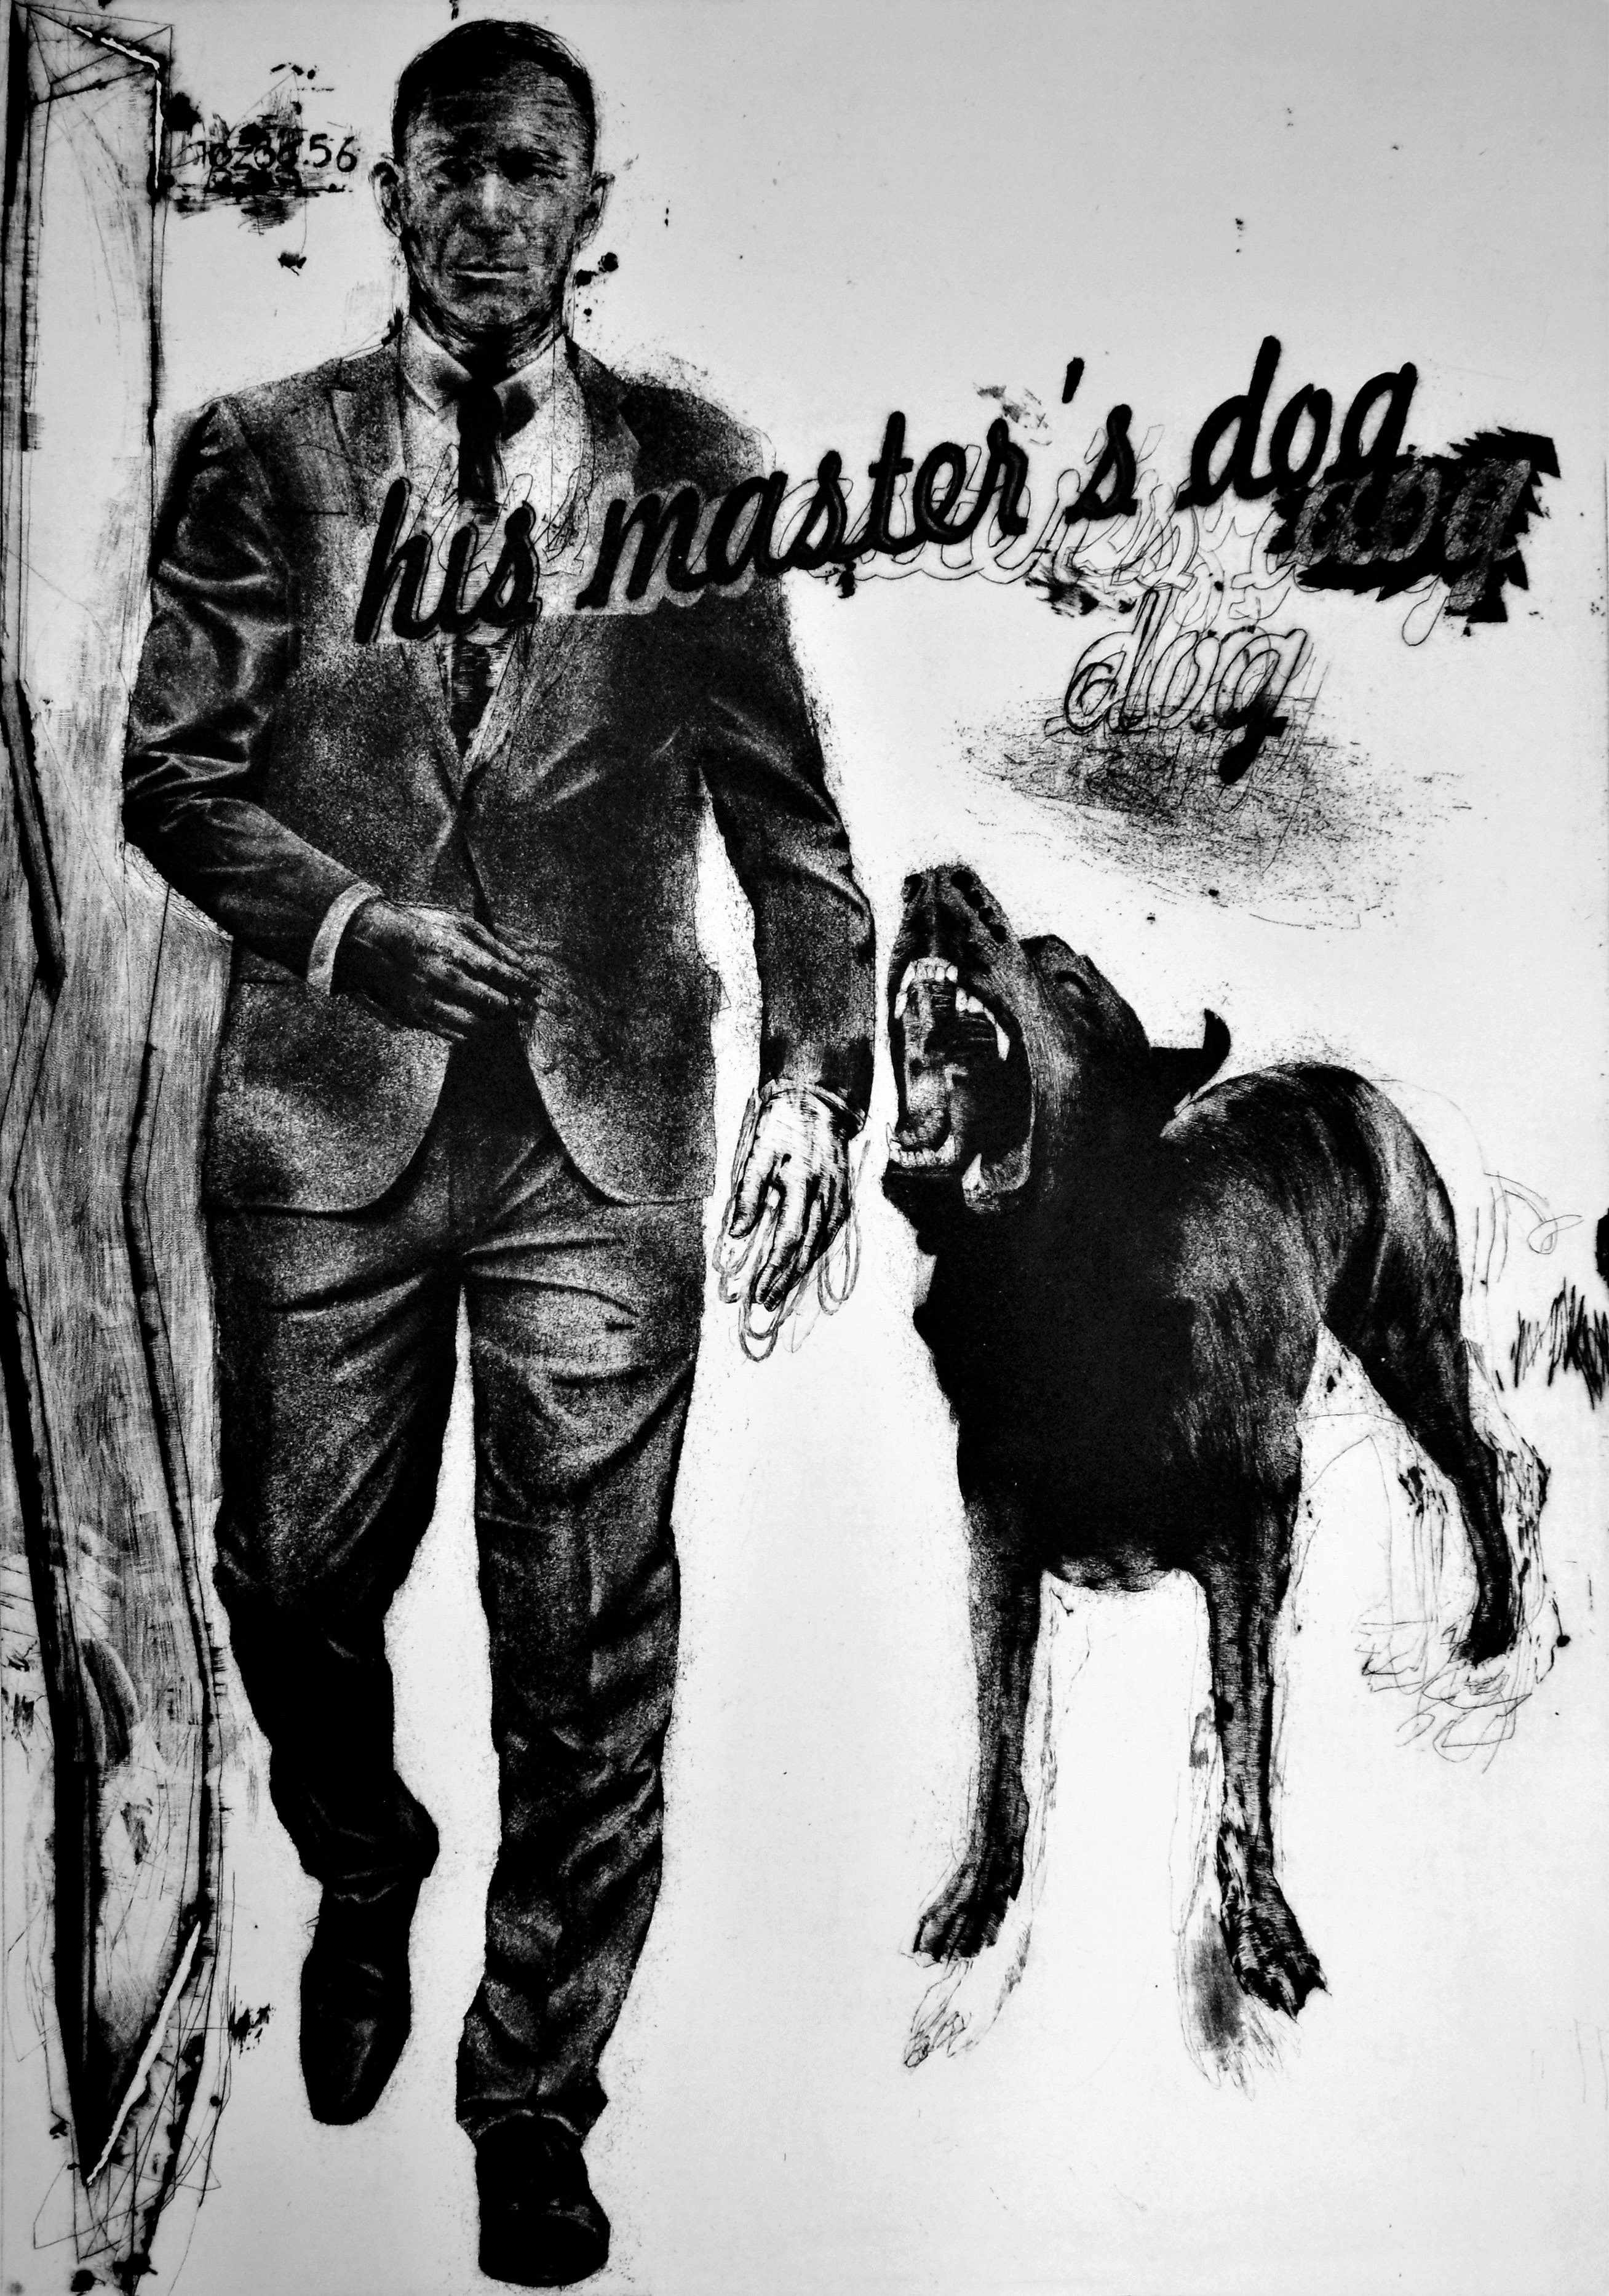 His Master's Dog, 2019